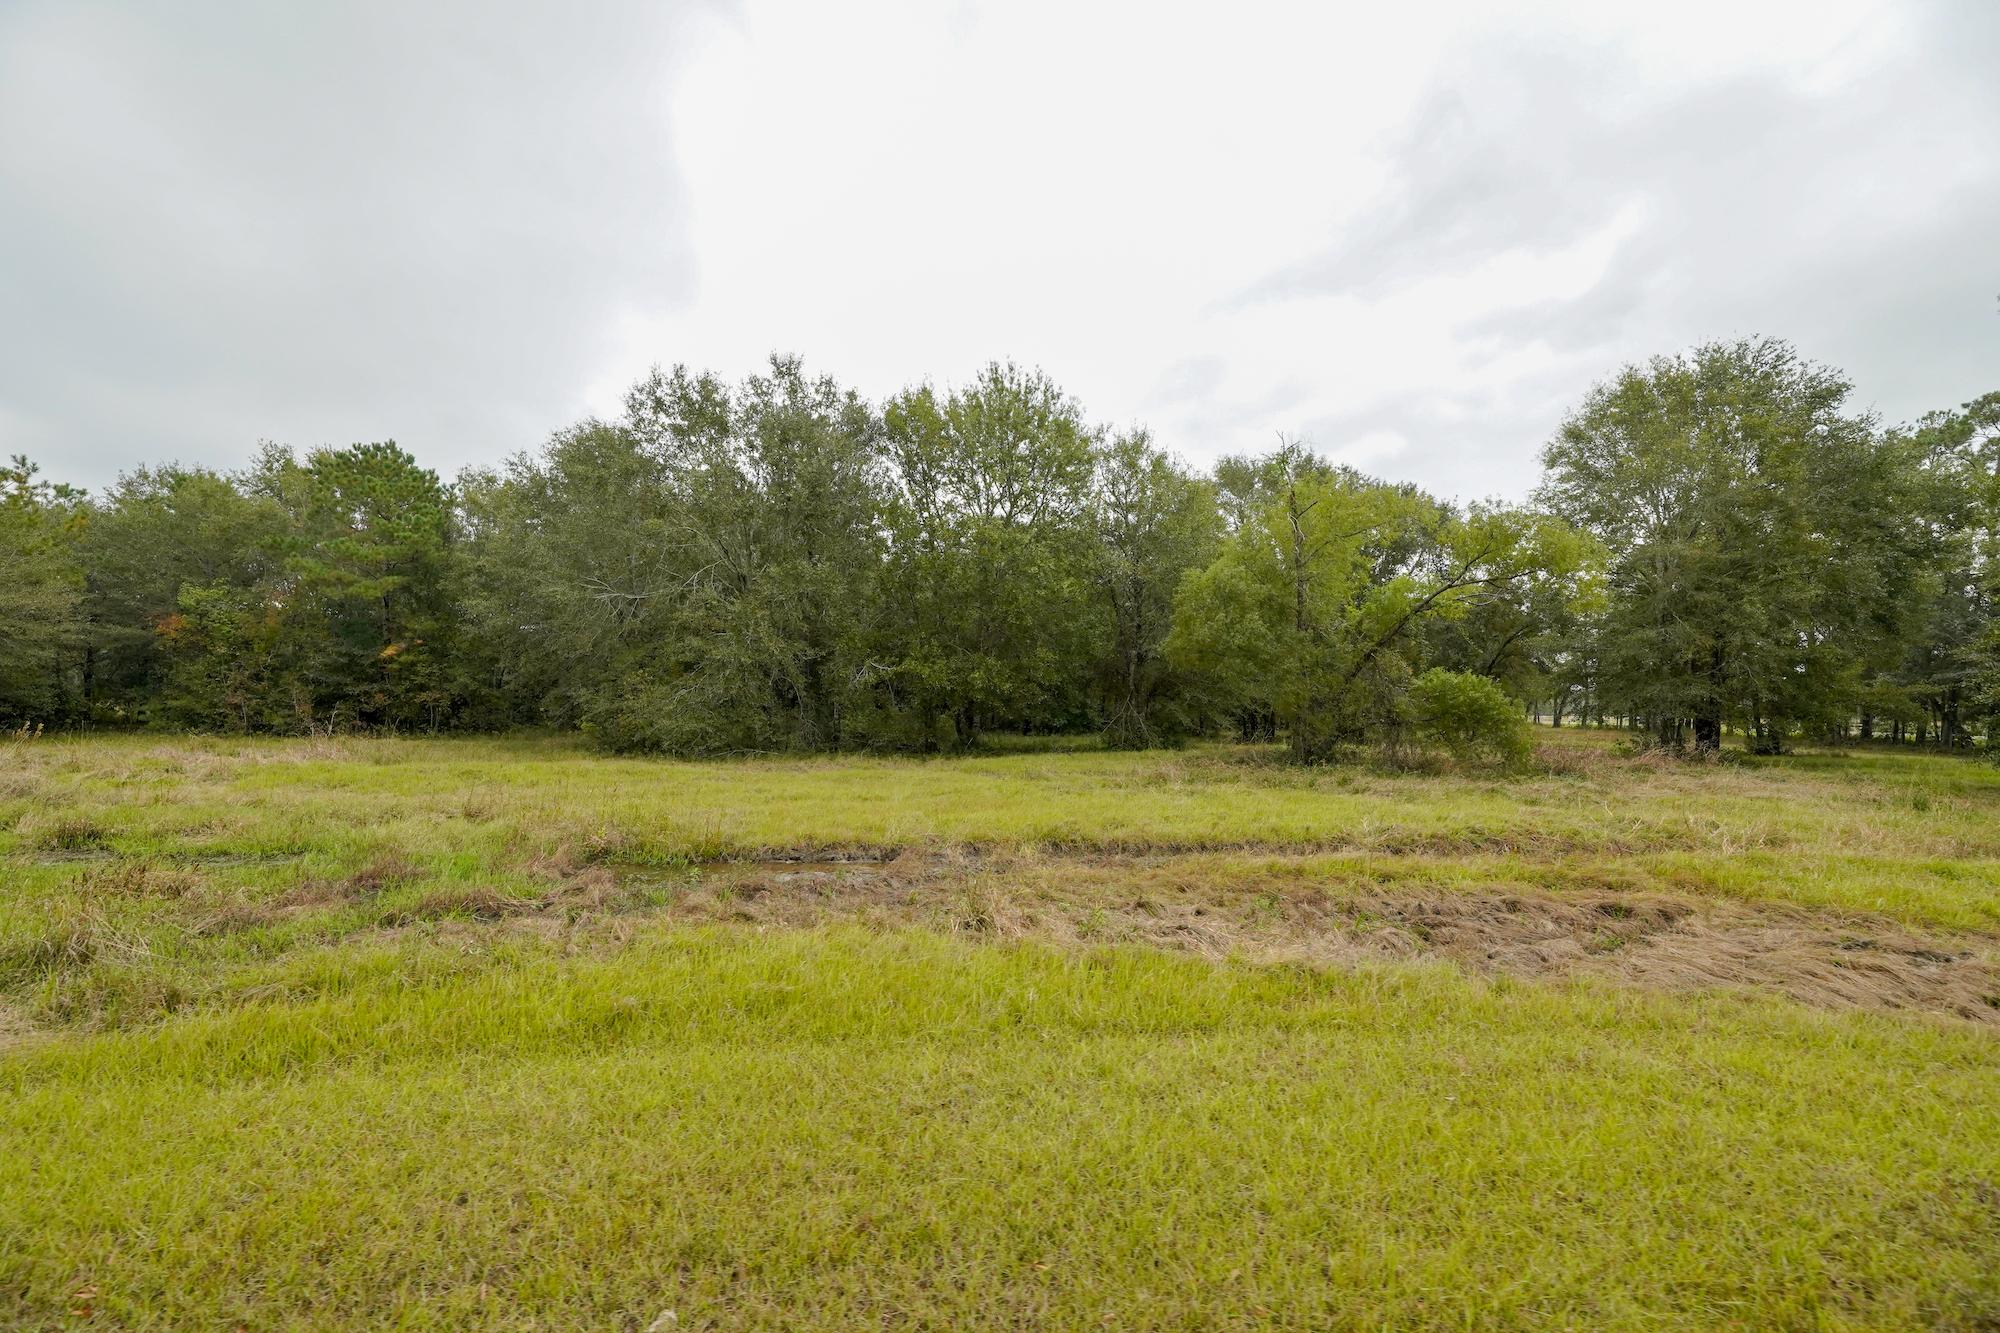 Jefferson County Development Land - Image 24 of 36